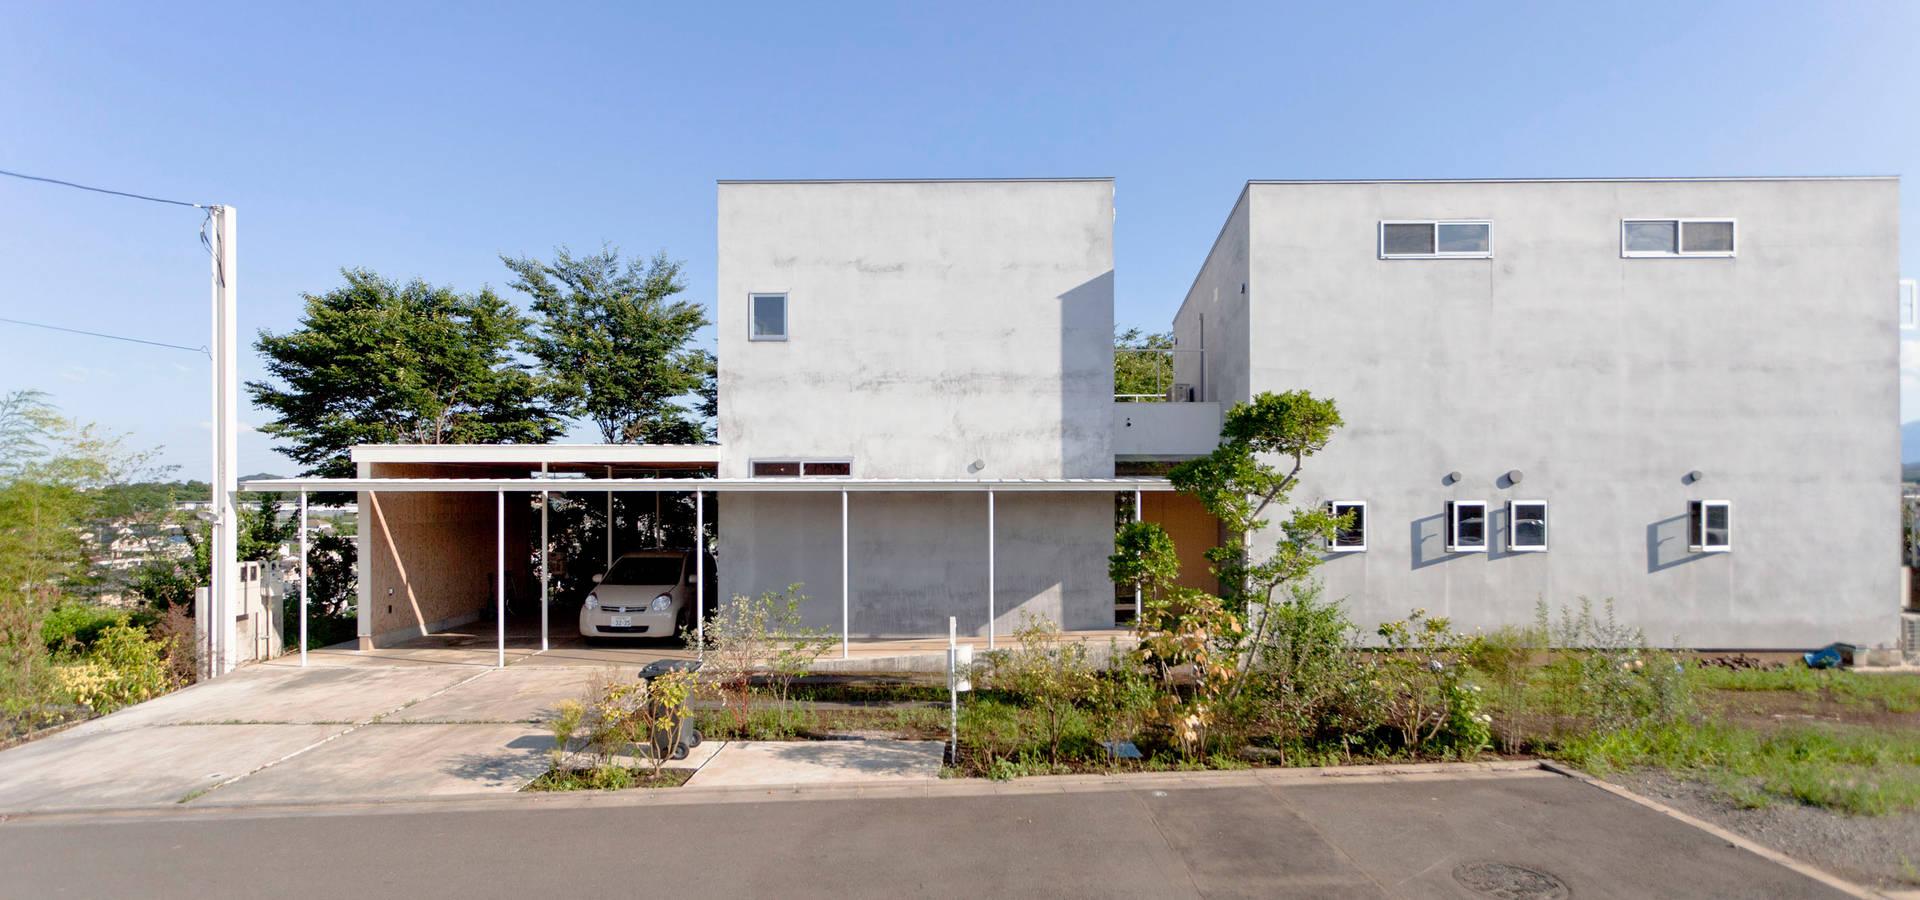 sun tan architects studio